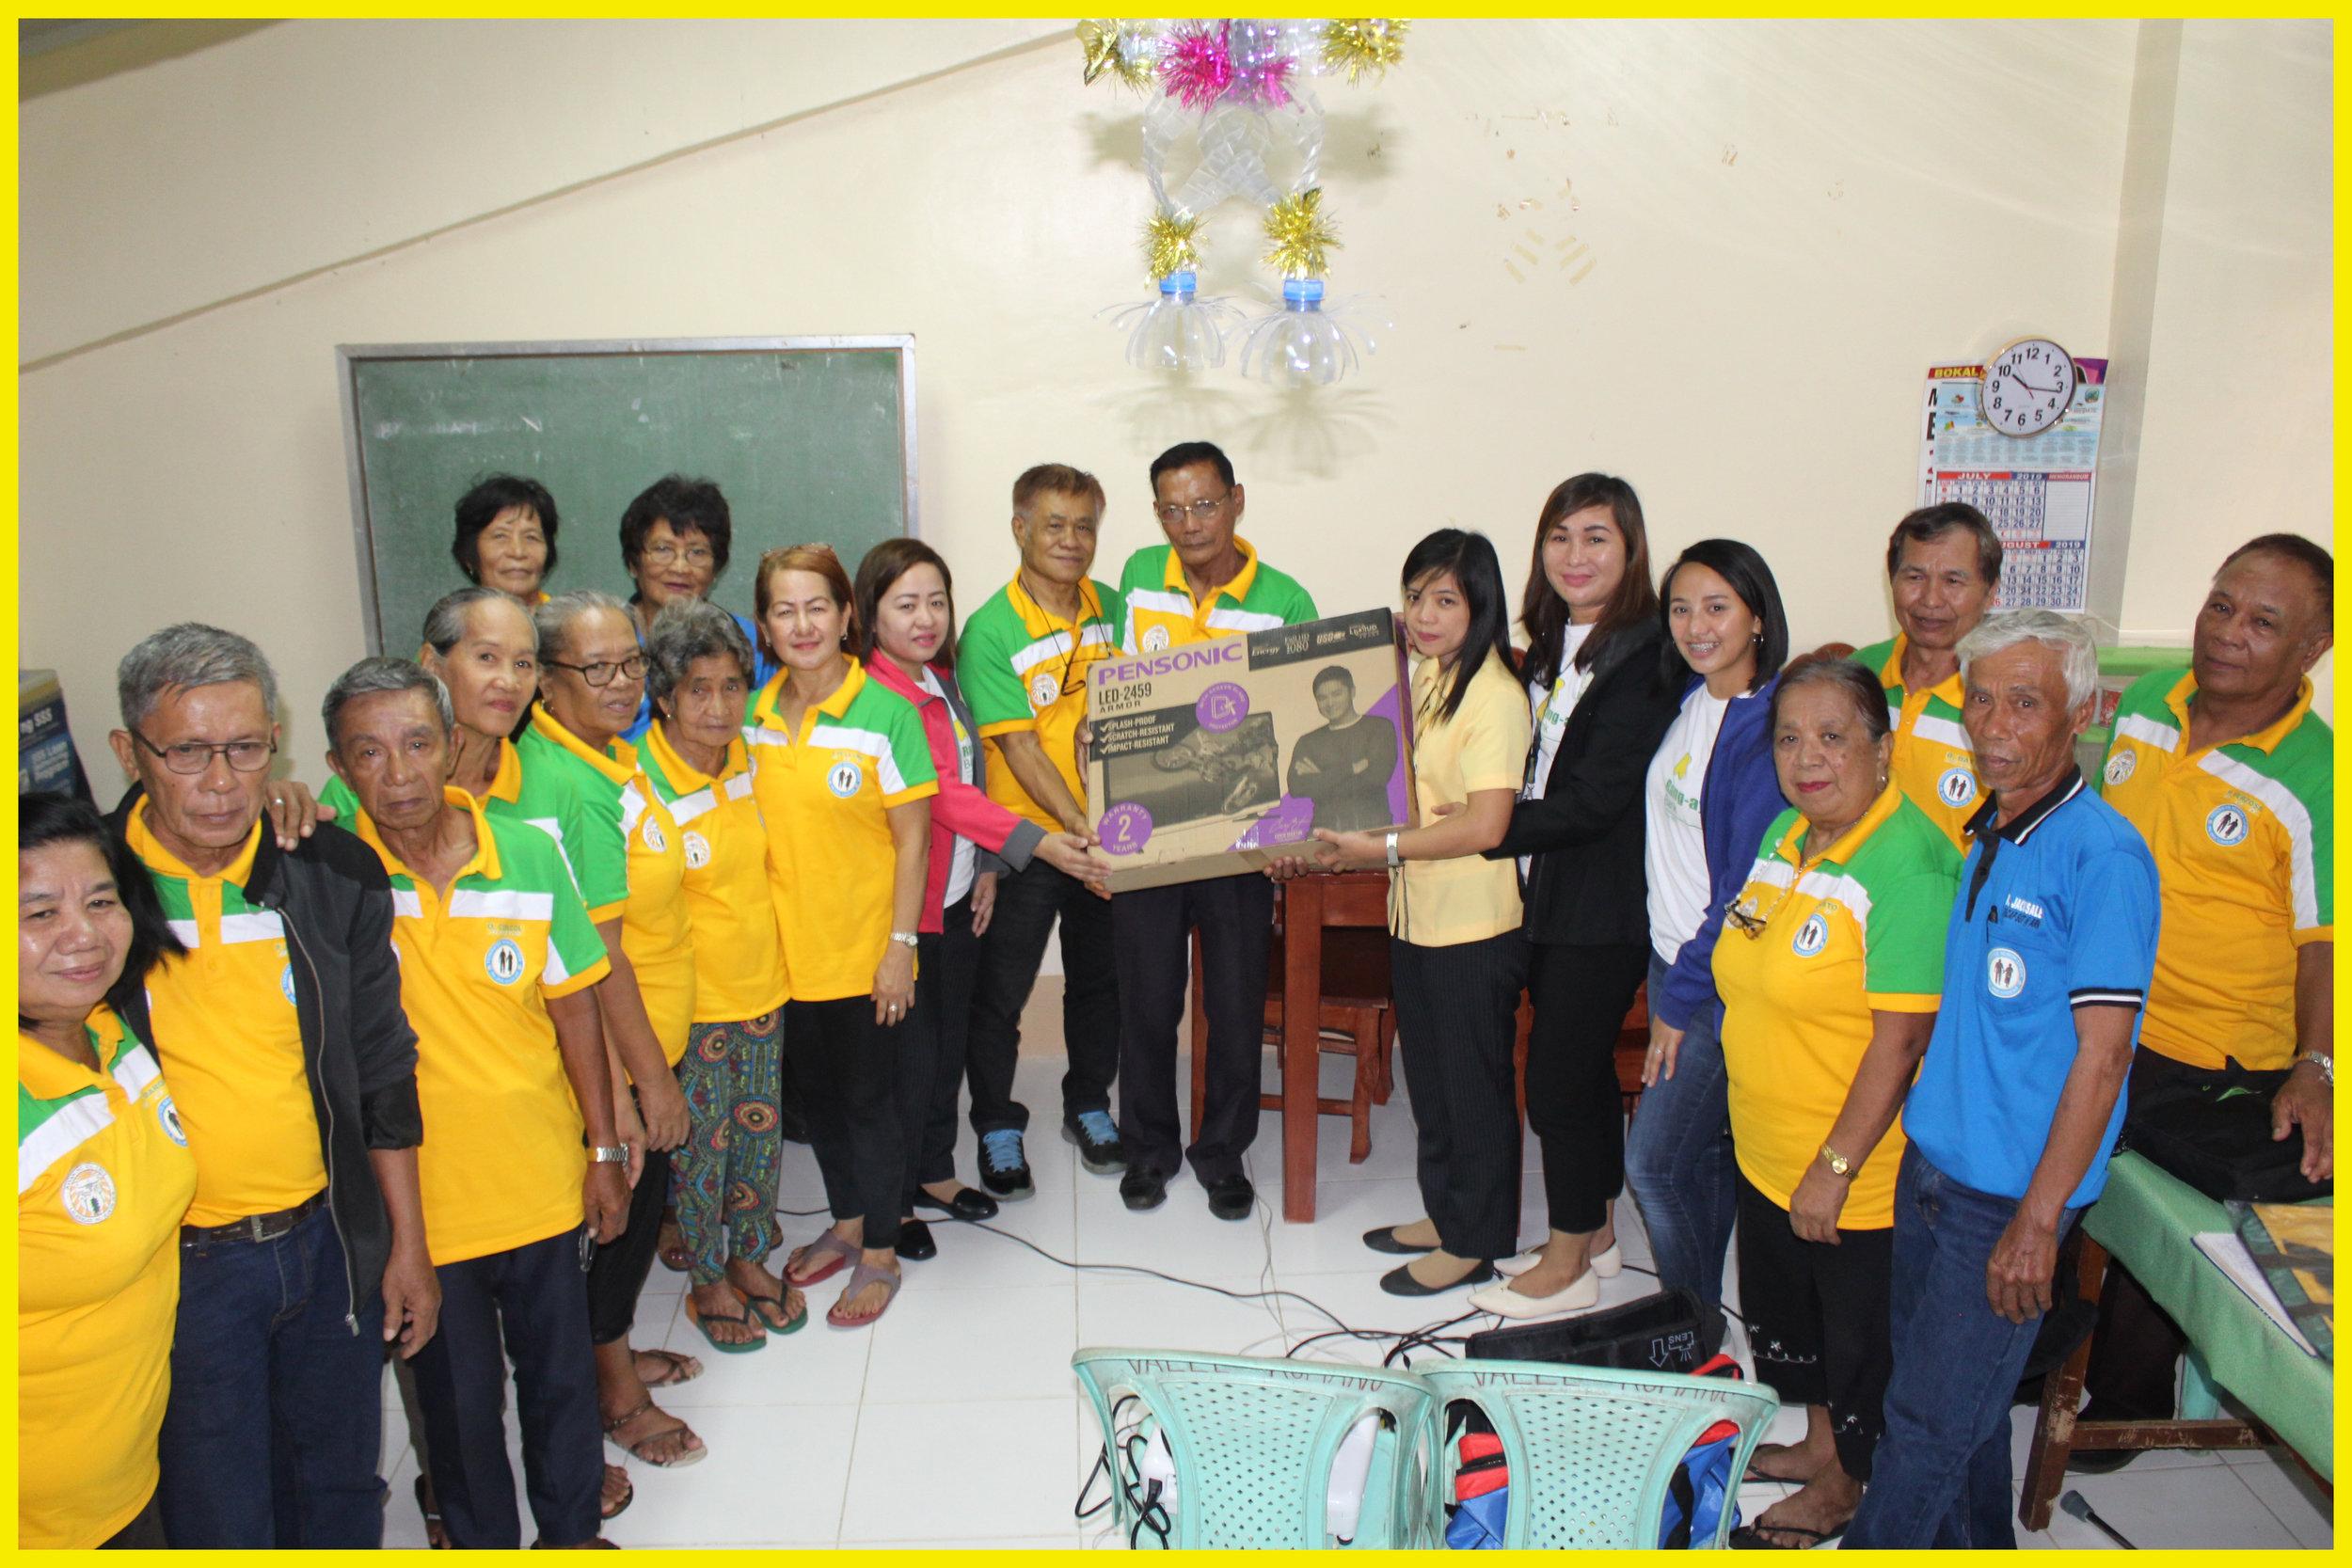 Sta Cruz (Ilocos Sur) Senior Citizens Association officers received the flat screen TV from Rang-ay Bank.